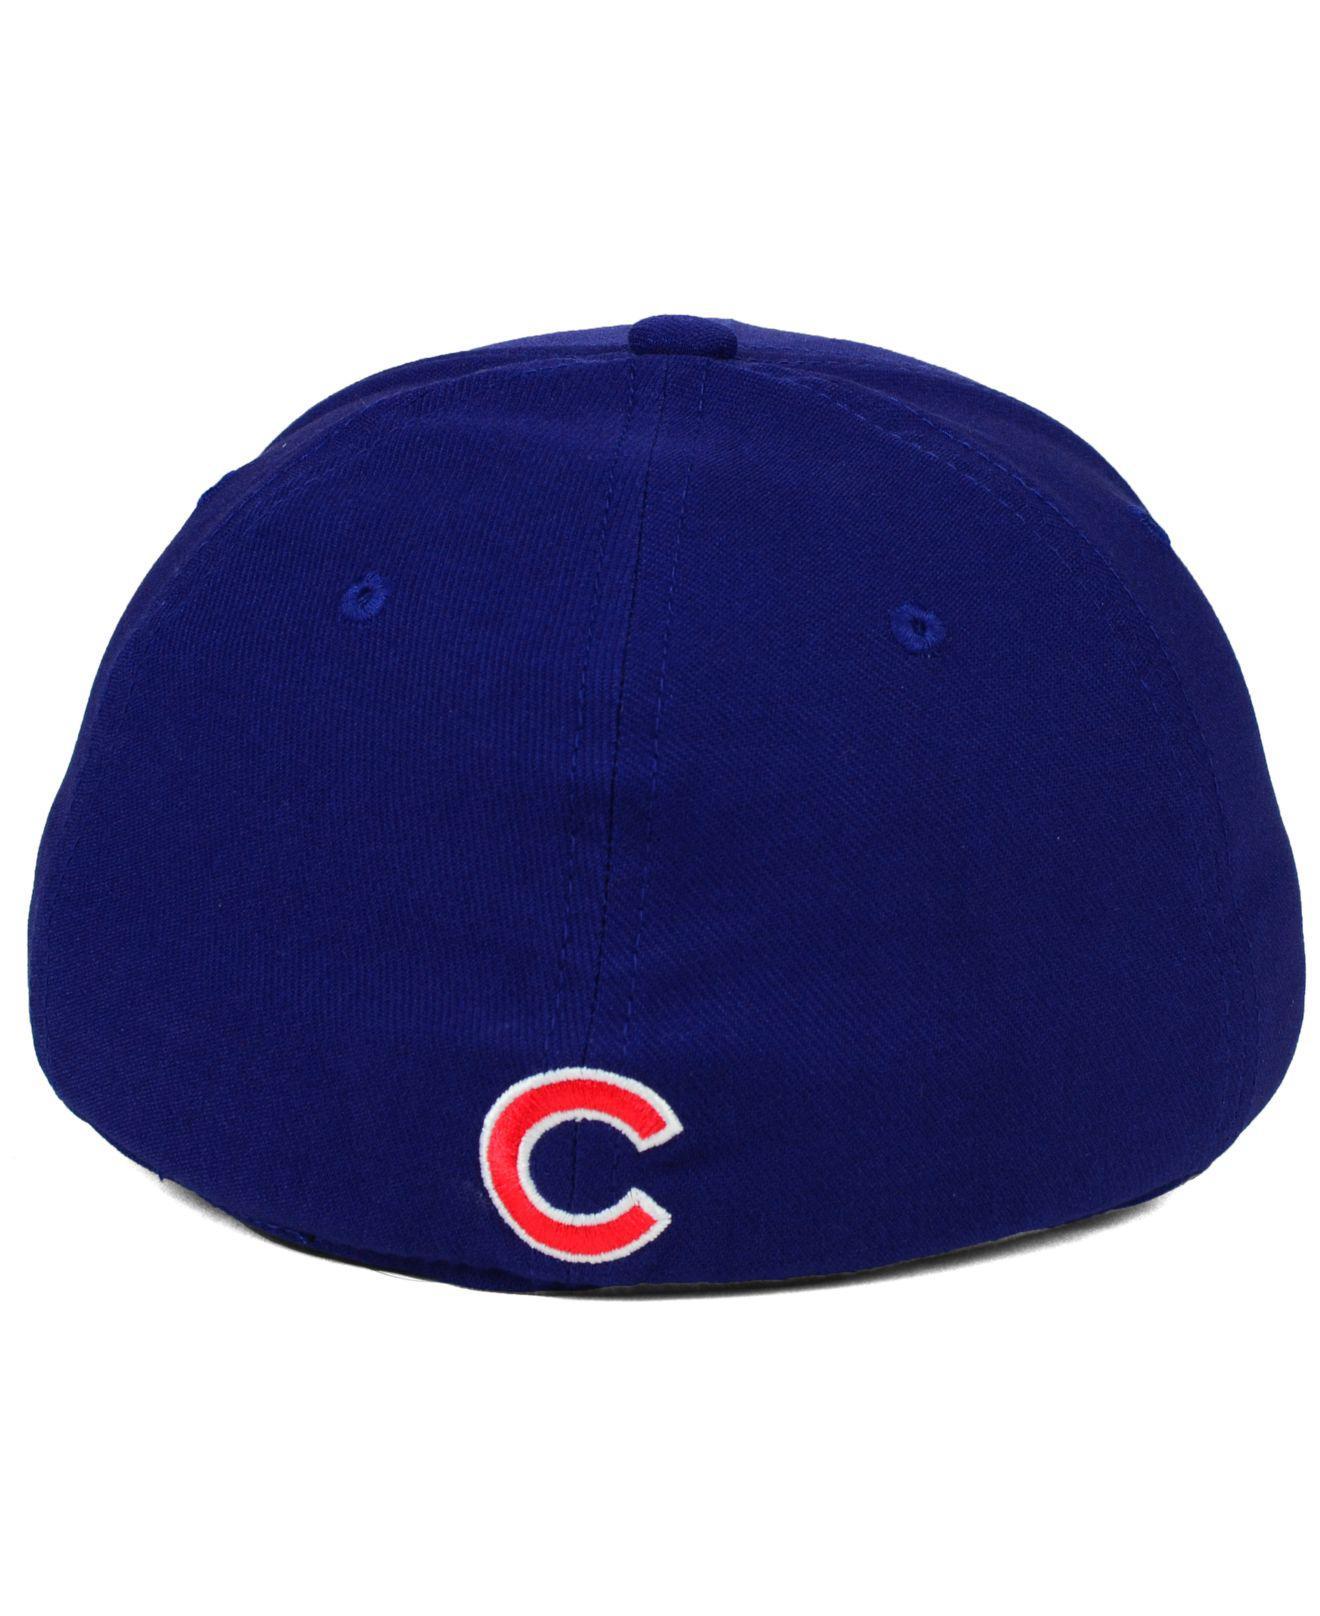 on sale 718b6 ea921 Lyst - Nike Chicago Cubs Ligature Swoosh Flex Cap in Blue for Men